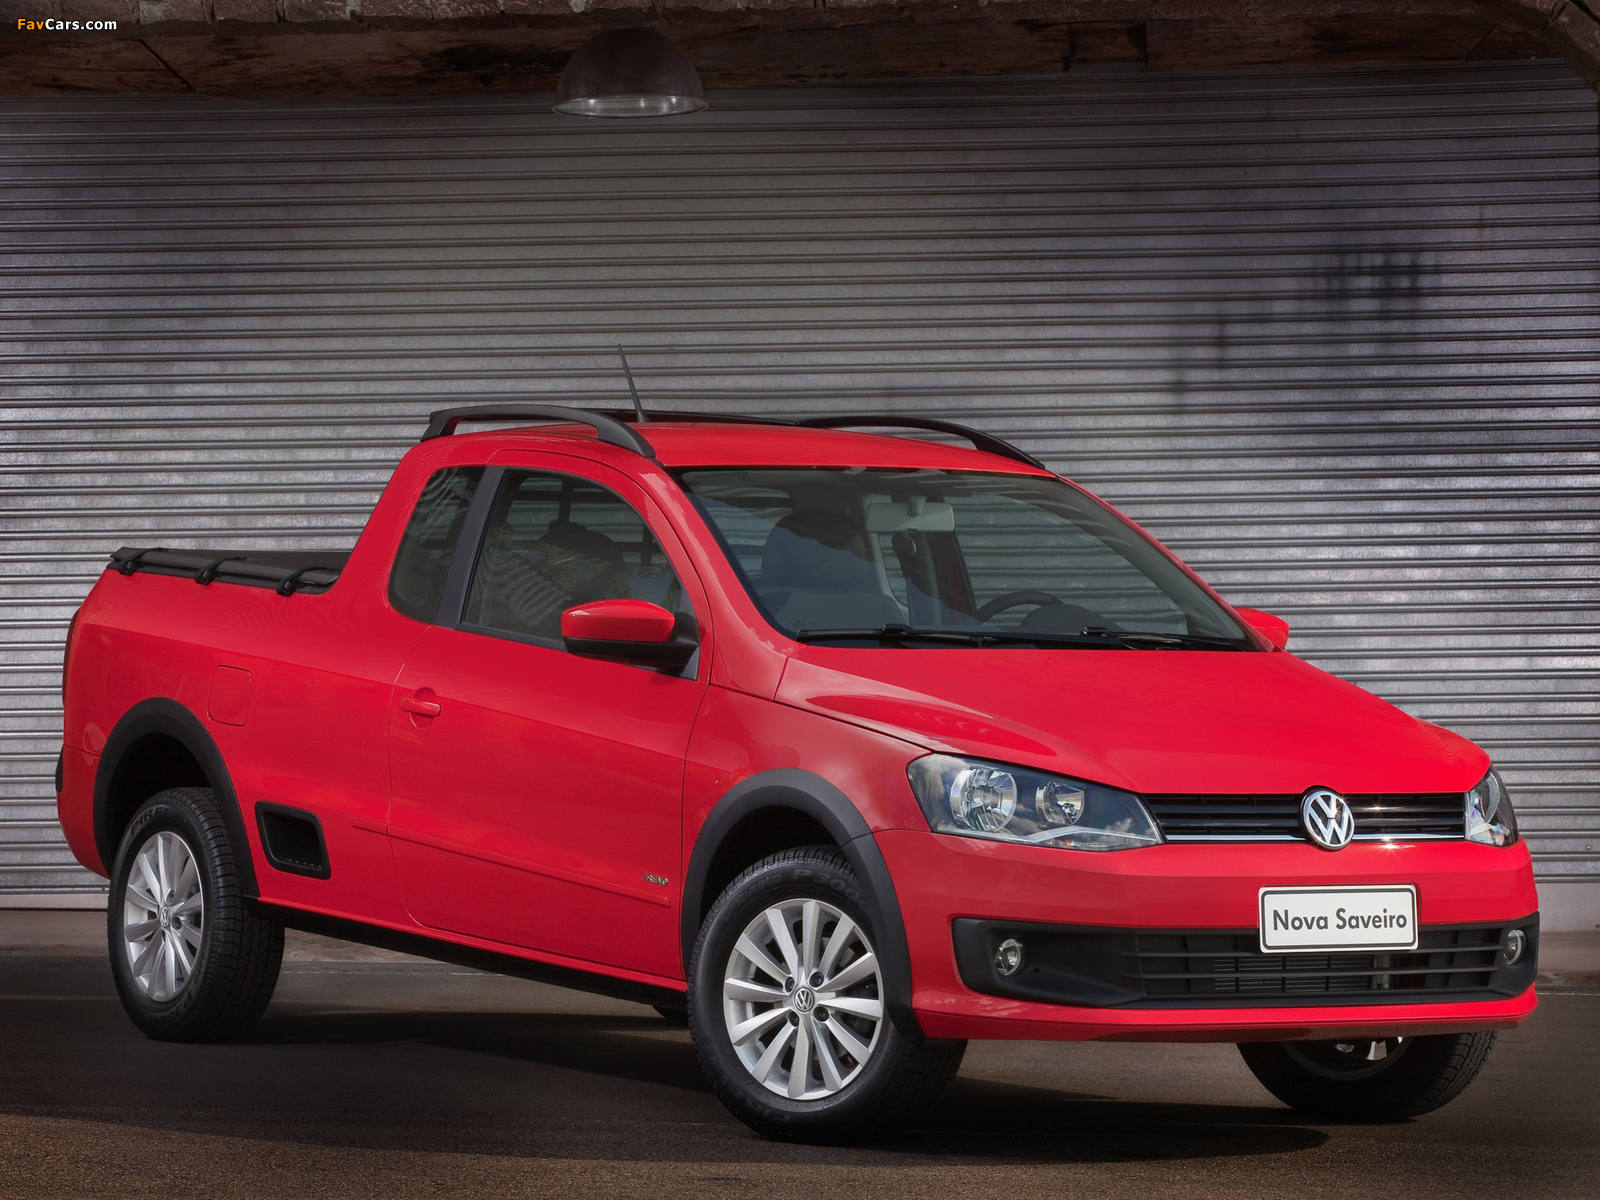 Volkswagen Saveiro Trend CE (V) 2013 images (1600 x 1200)